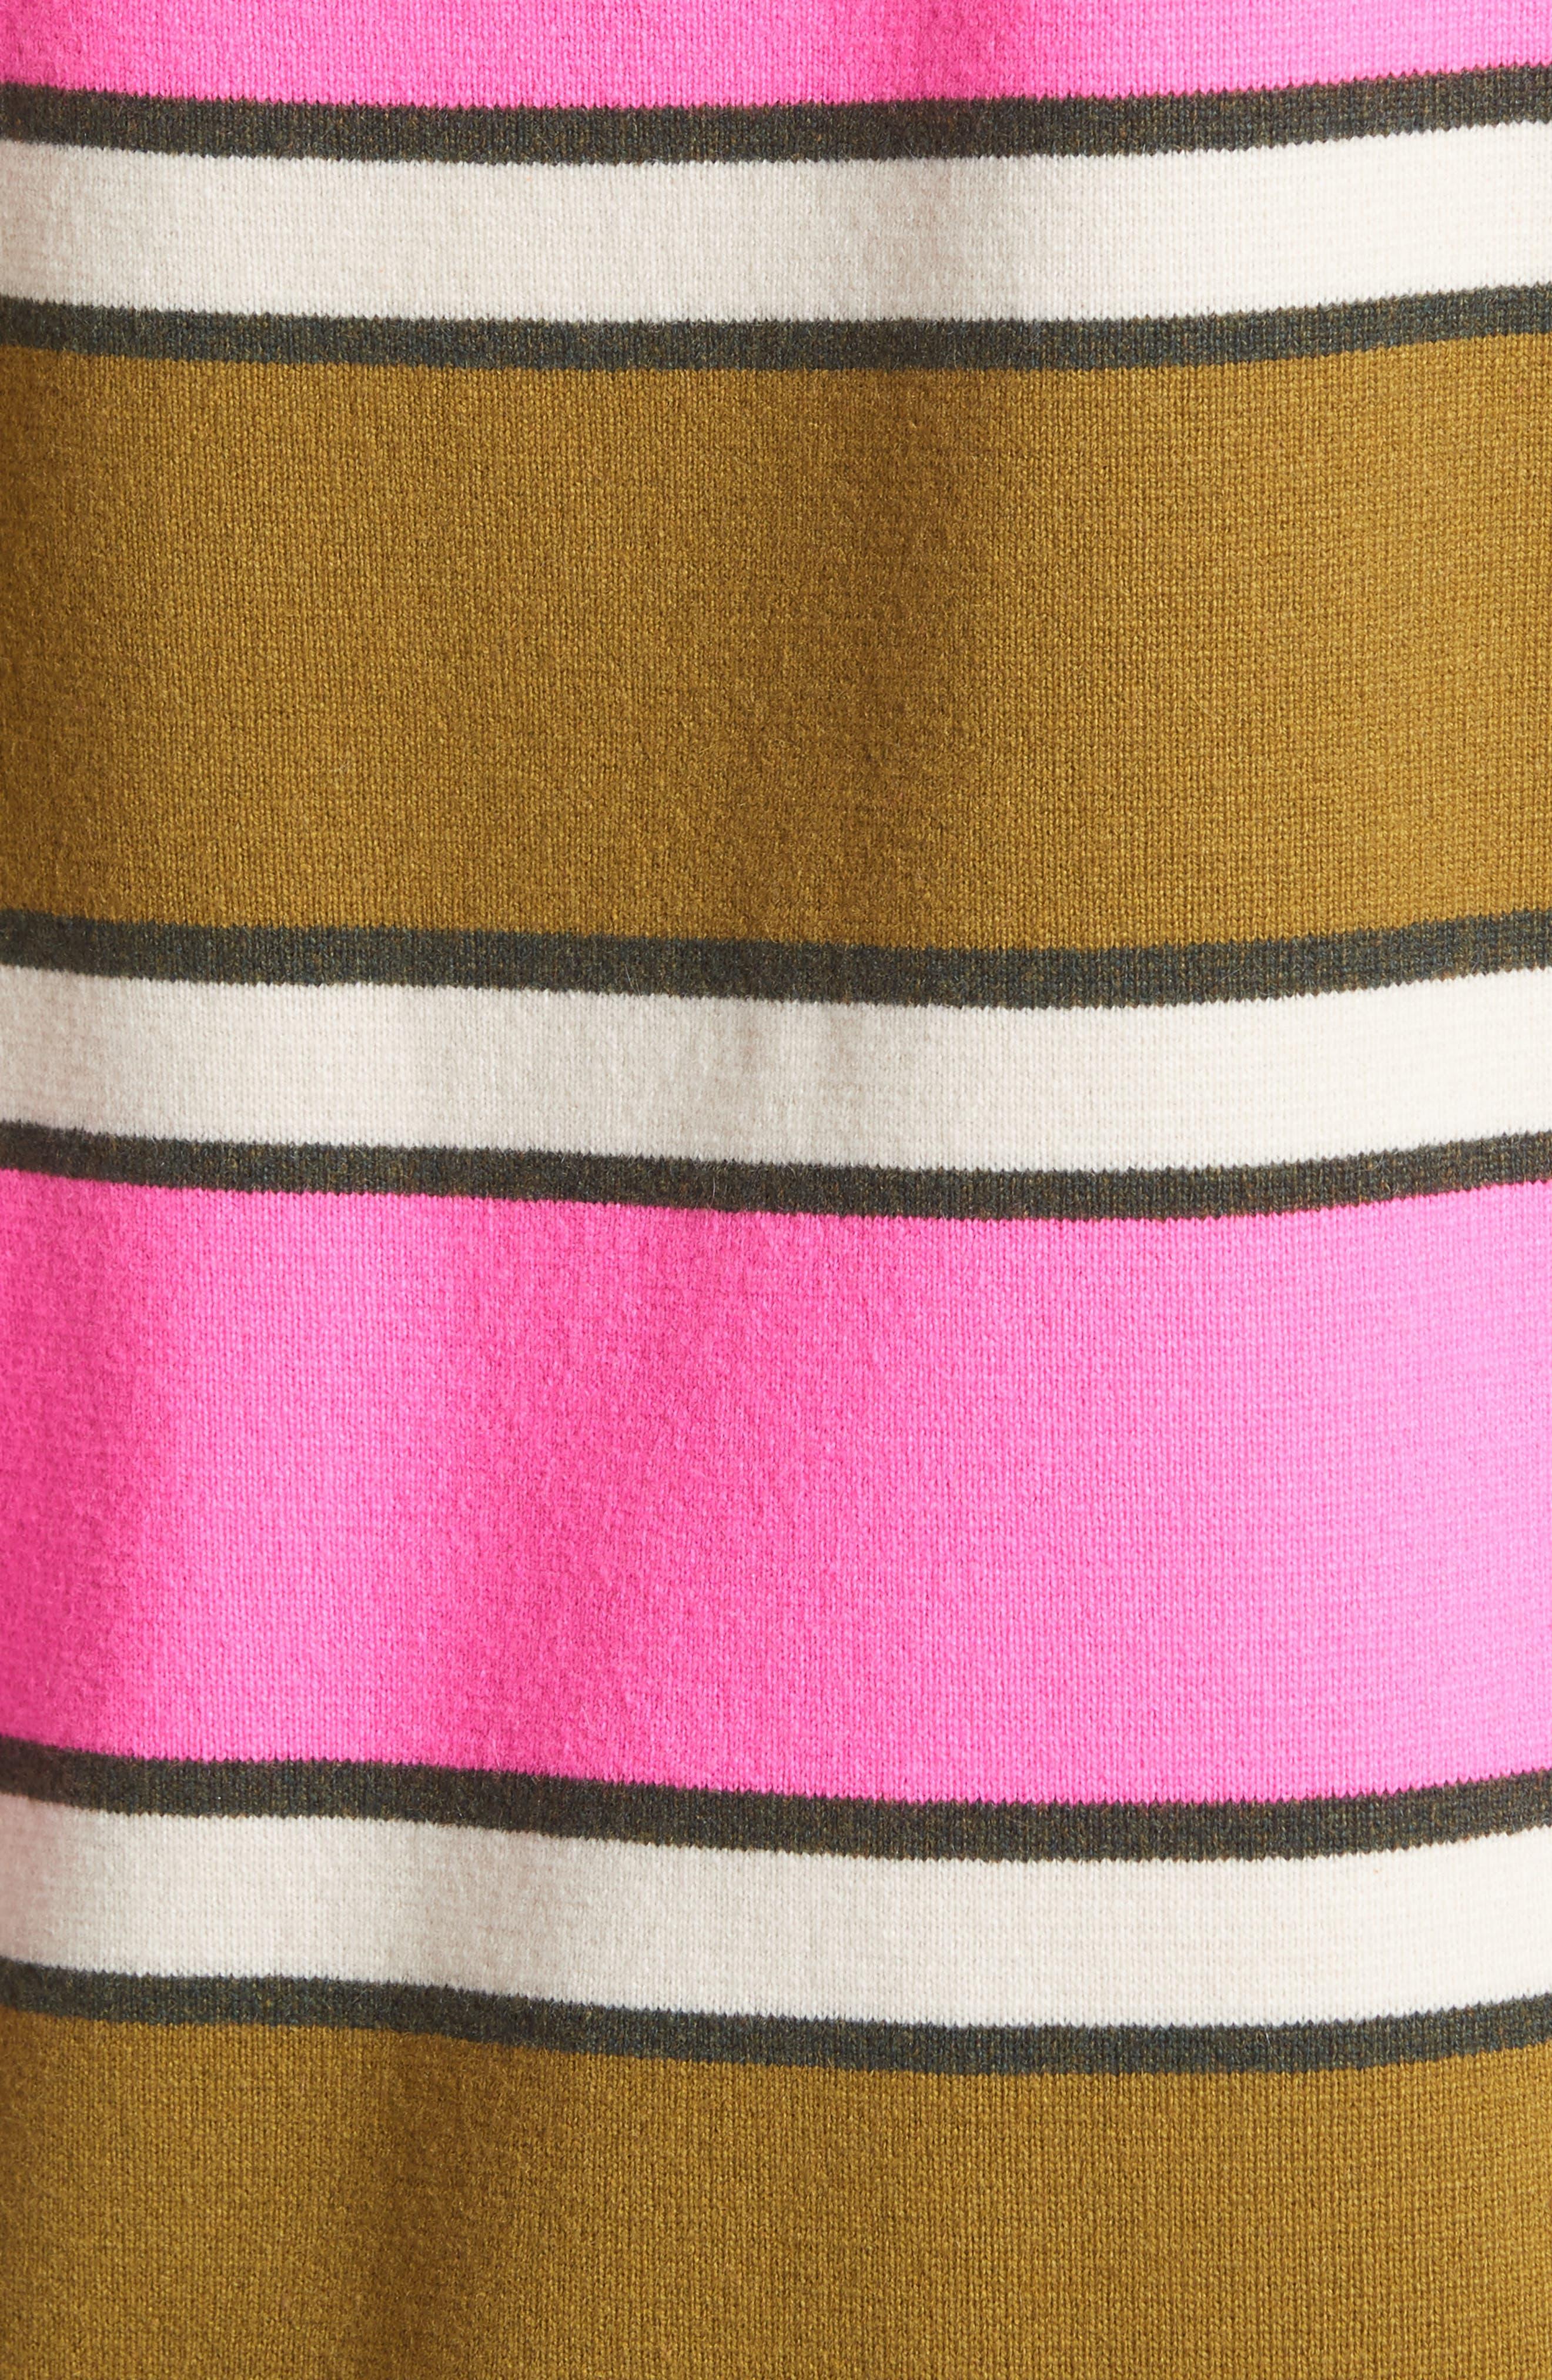 Oversize Stripe Cashmere Sweater,                             Alternate thumbnail 6, color,                             Pink Multi